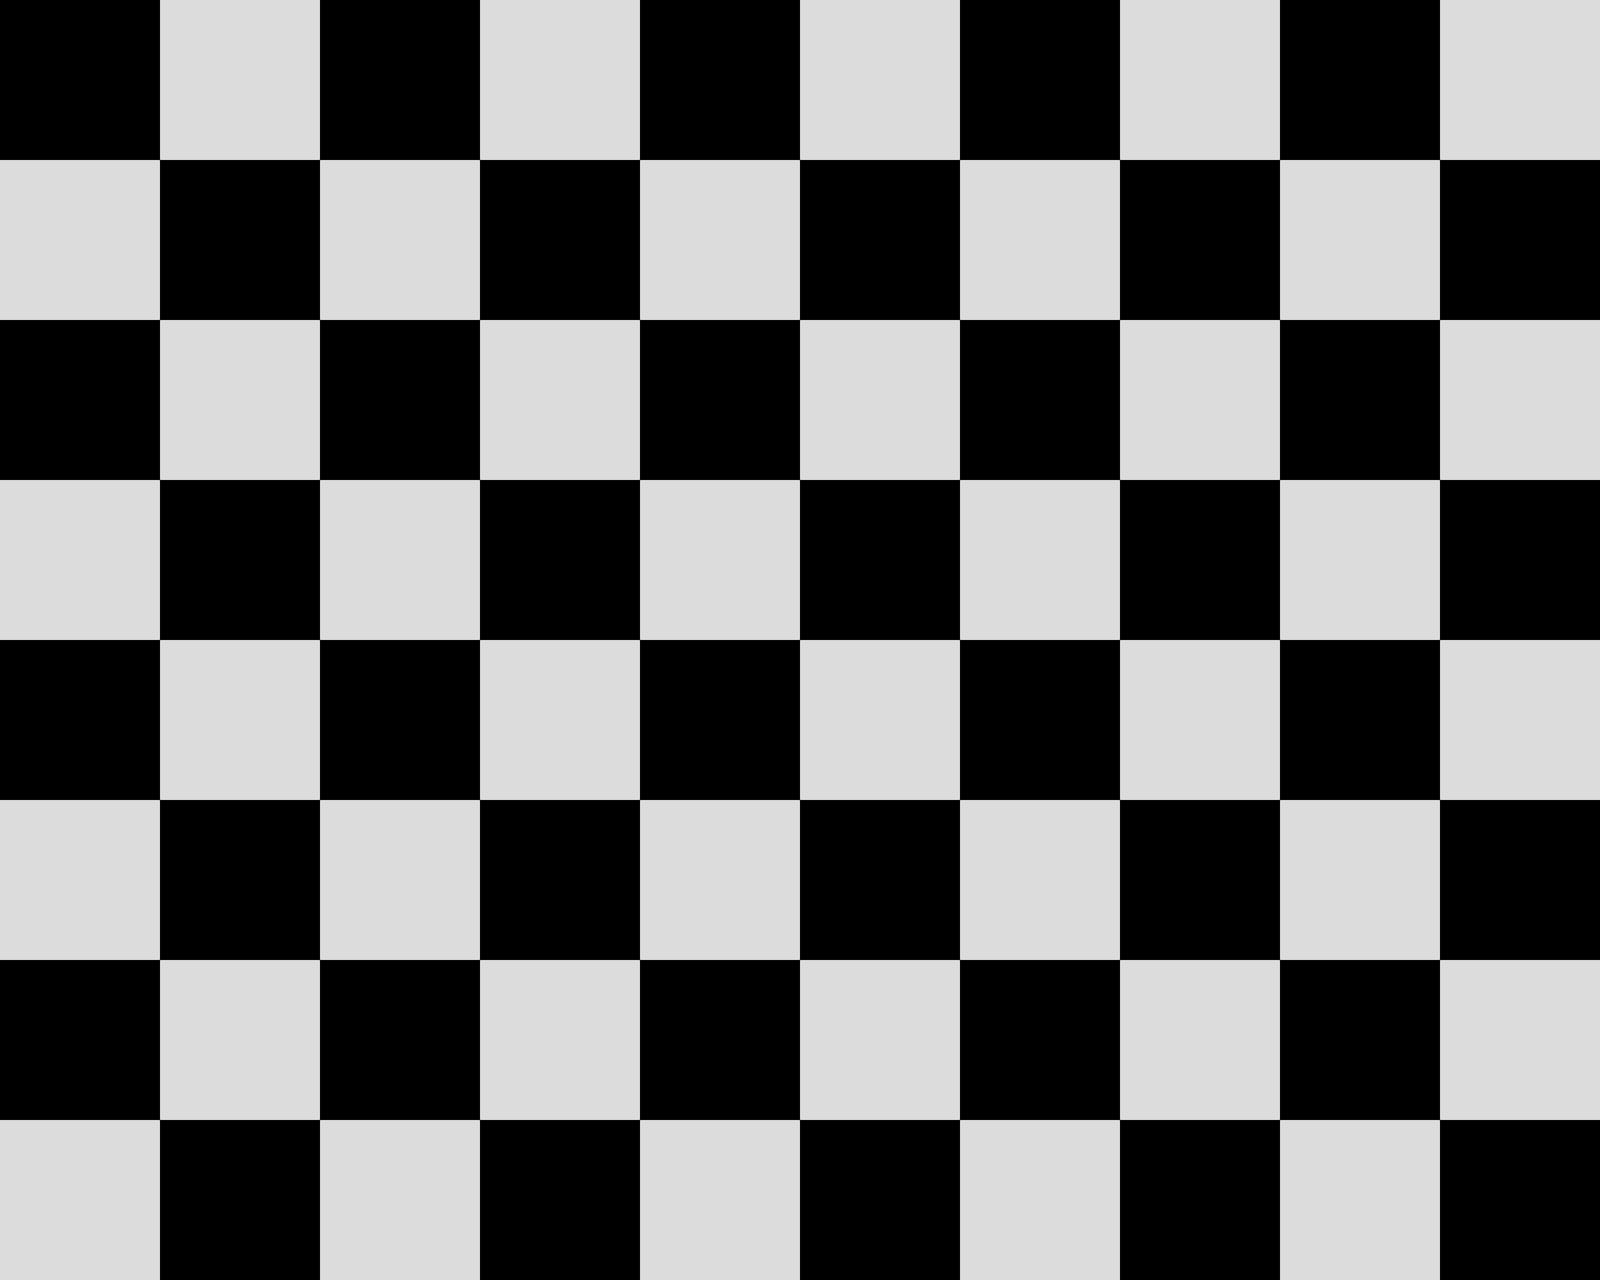 26 Black And White Checkered Wallpaper On Wallpapersafari